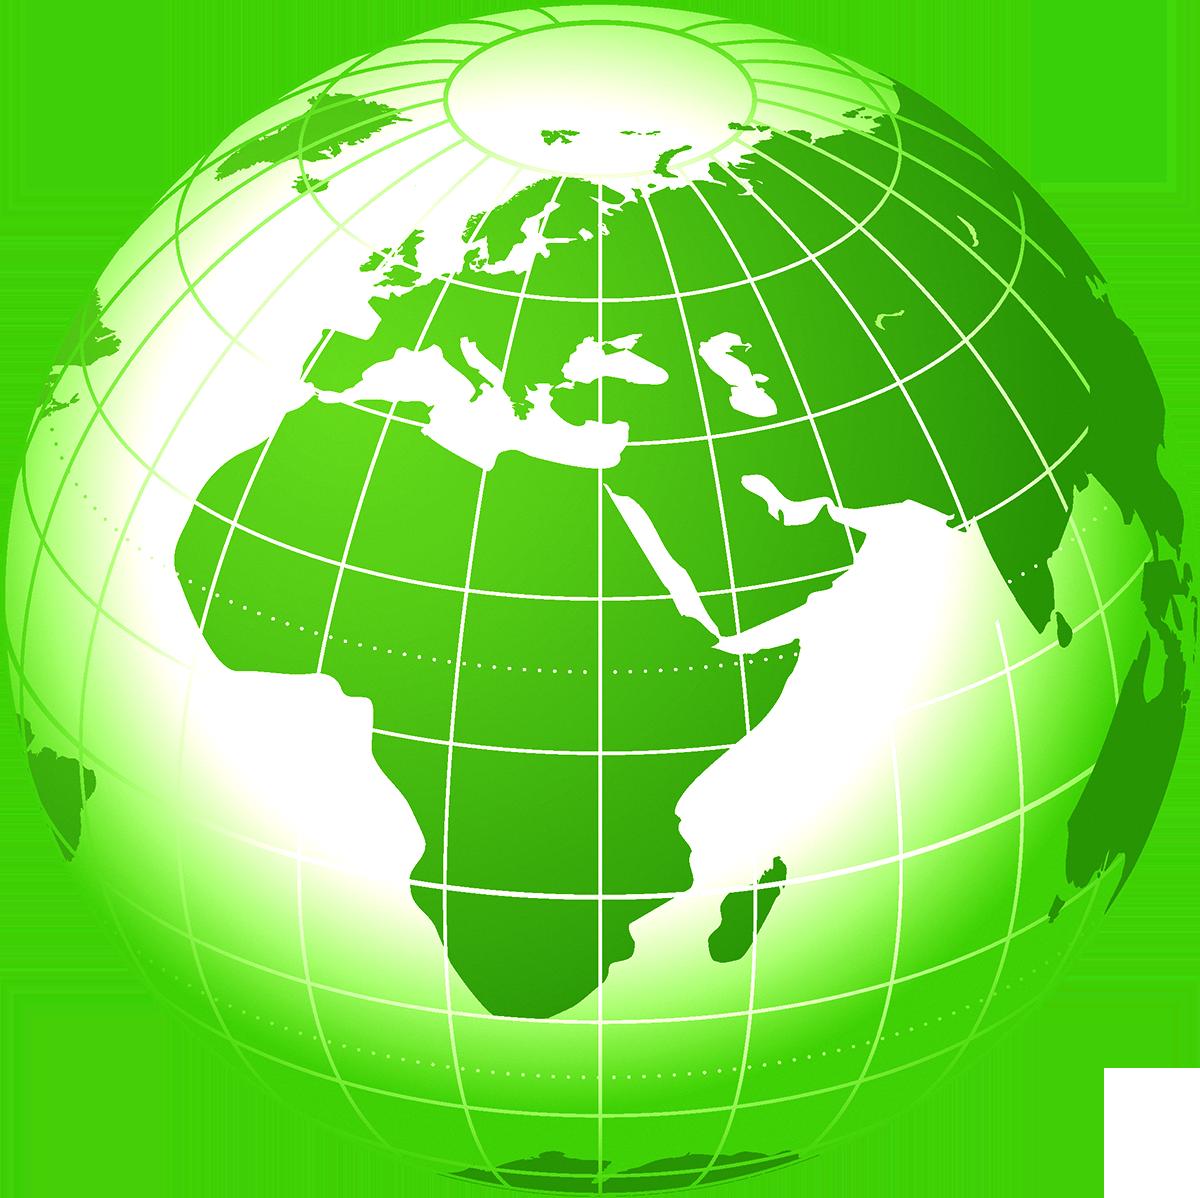 Apple globe world map clipart clip transparent stock Earth Globe World map - Green Earth 1200*1198 transprent Png Free ... clip transparent stock